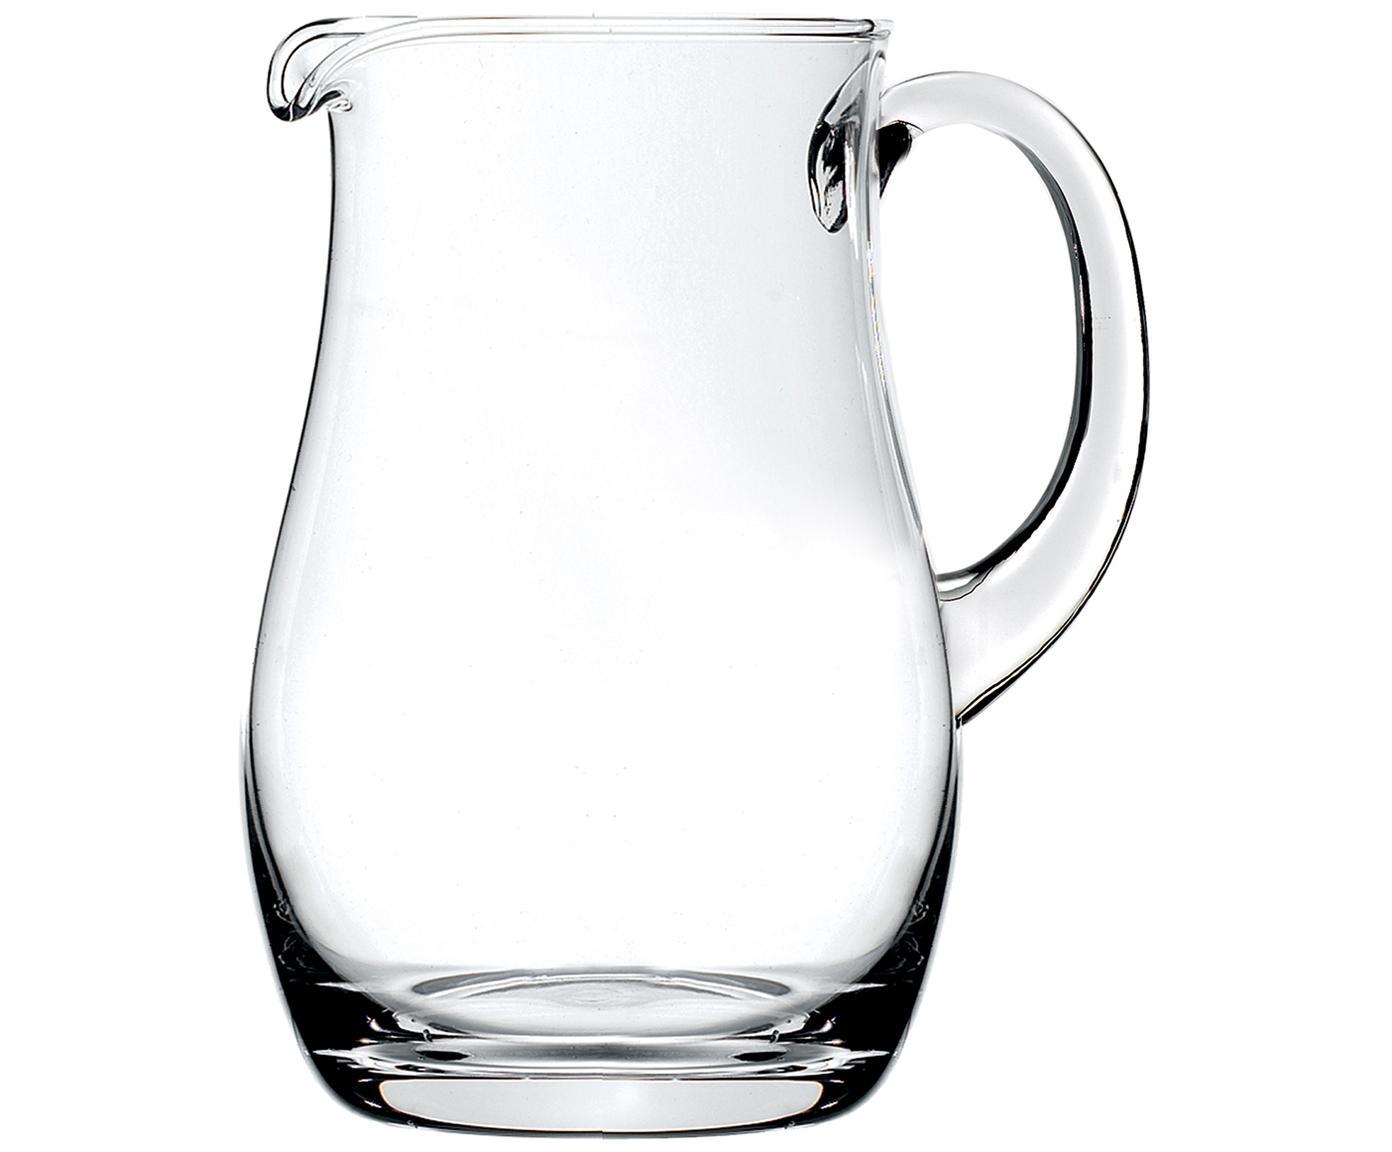 Kristall-Krug Brocca, Luxion-Kristallglas, Transparent, 1.5 L